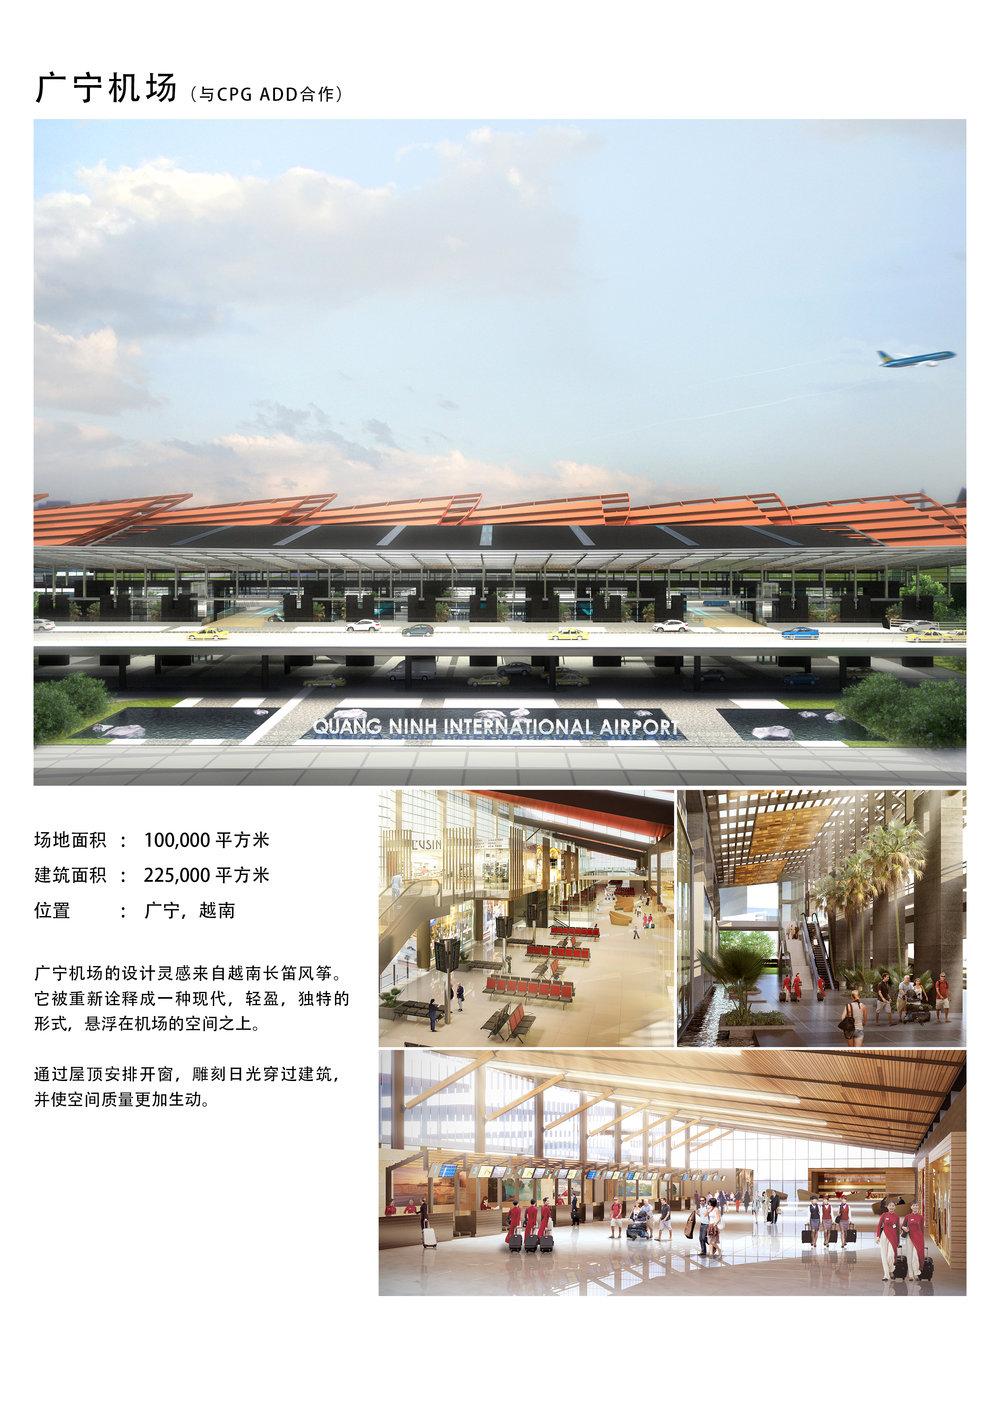 14_QuanNinhAirport_cn.jpg